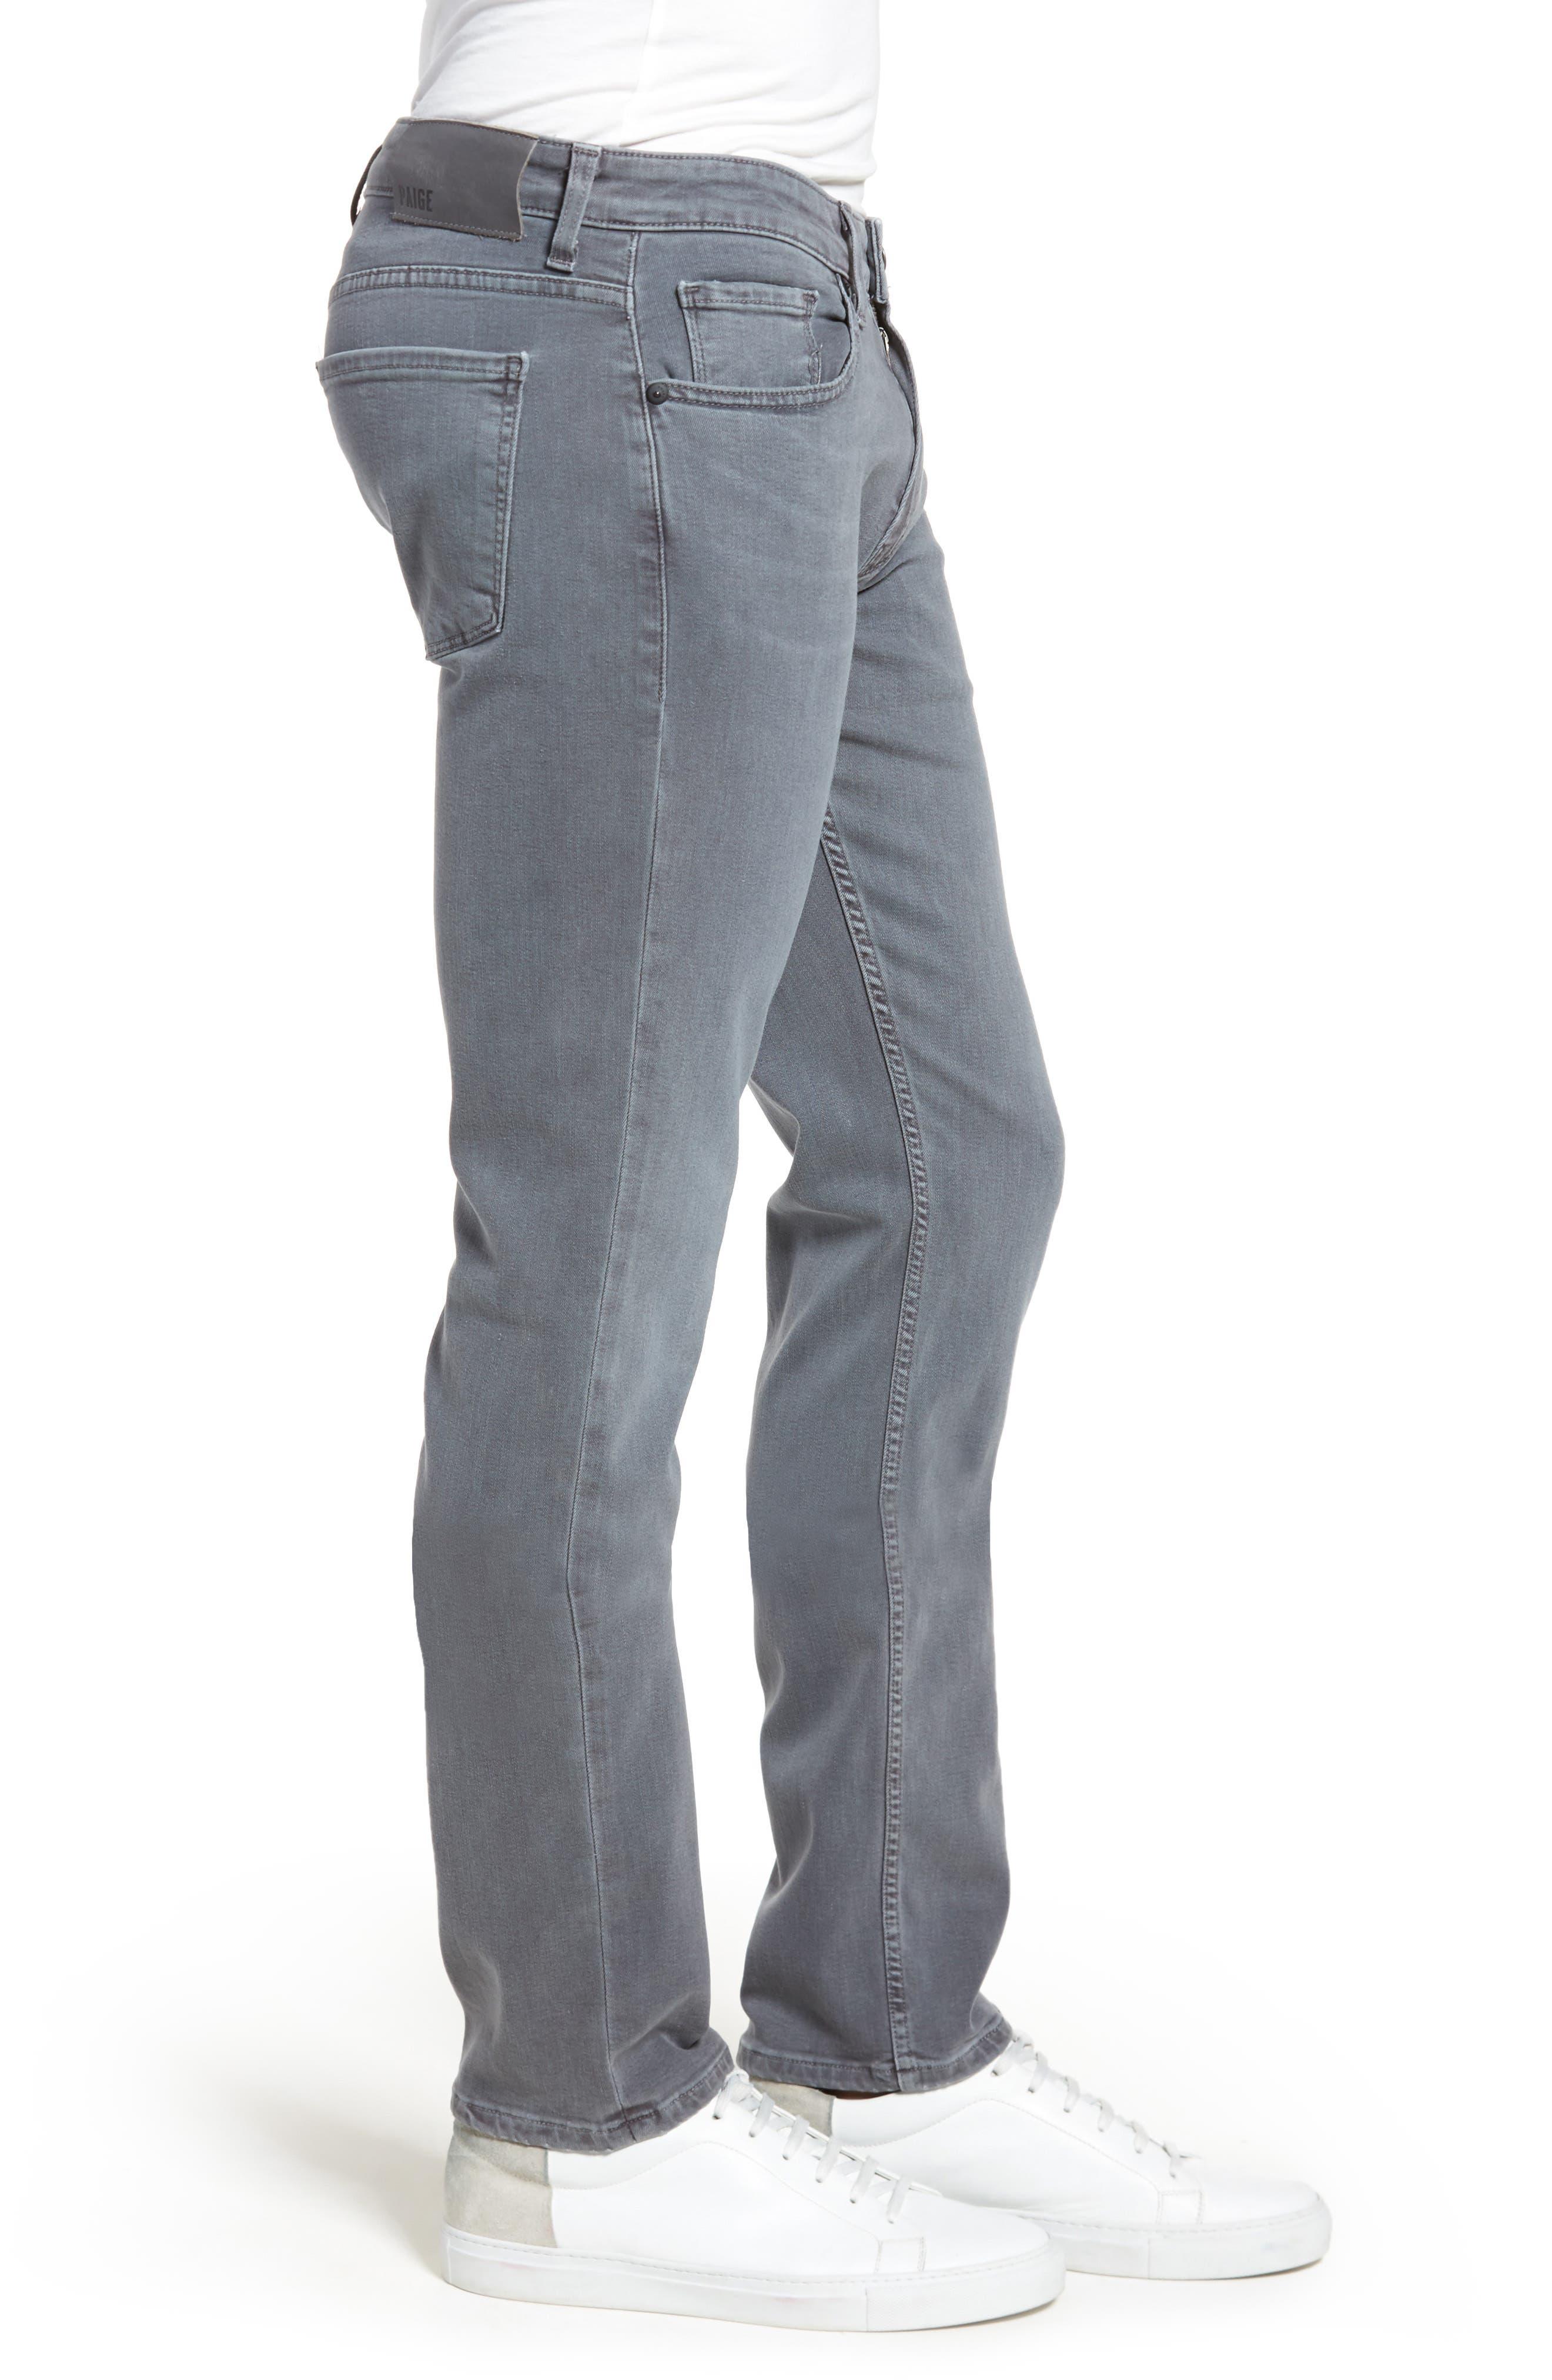 Transcend - Lennox Slim Fit Jeans,                             Alternate thumbnail 3, color,                             020